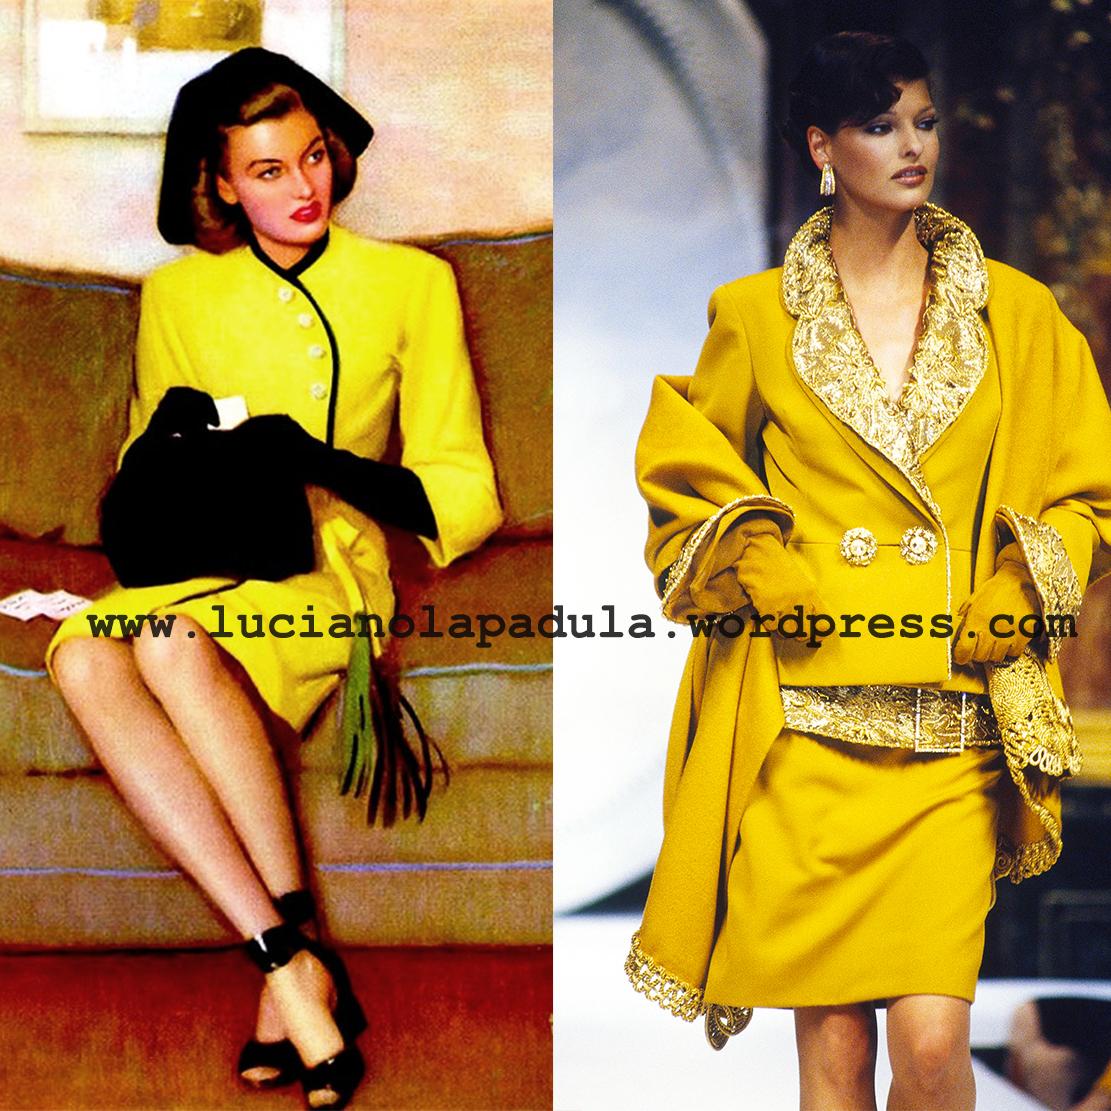 andrew loomis linda evangelista yellow suit art blog fashion museum storia luciano lapadula moda christian dior 1992 1993